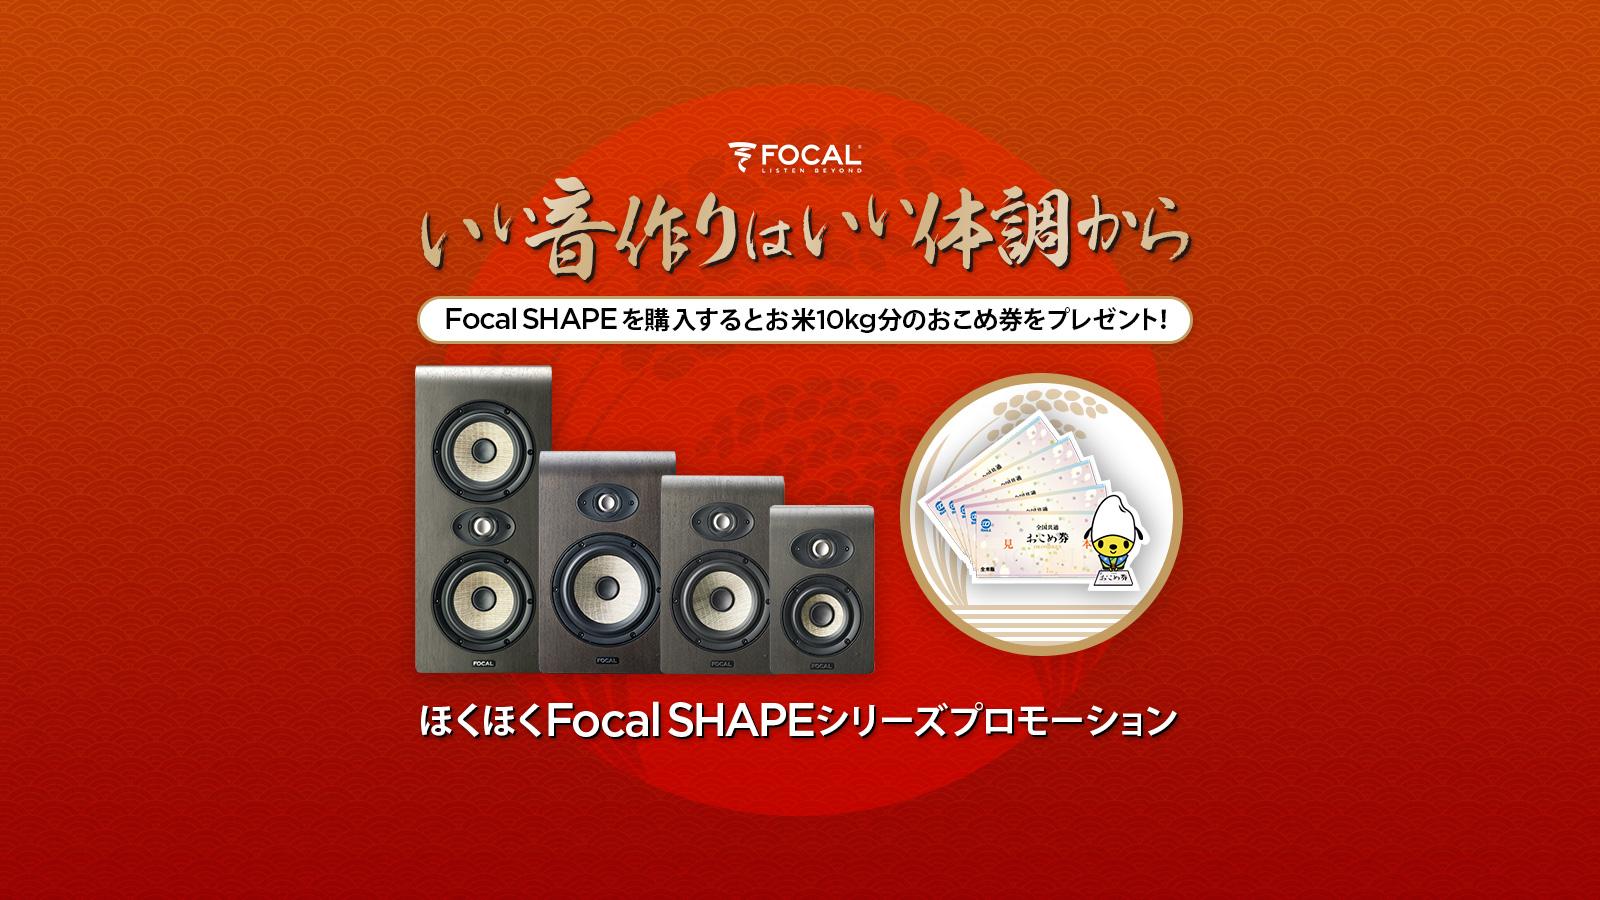 FOCAL PROFESSIONAL SHAPE 50(ペア)【ペア購入対象:10kg分のおこめ券プレゼント】